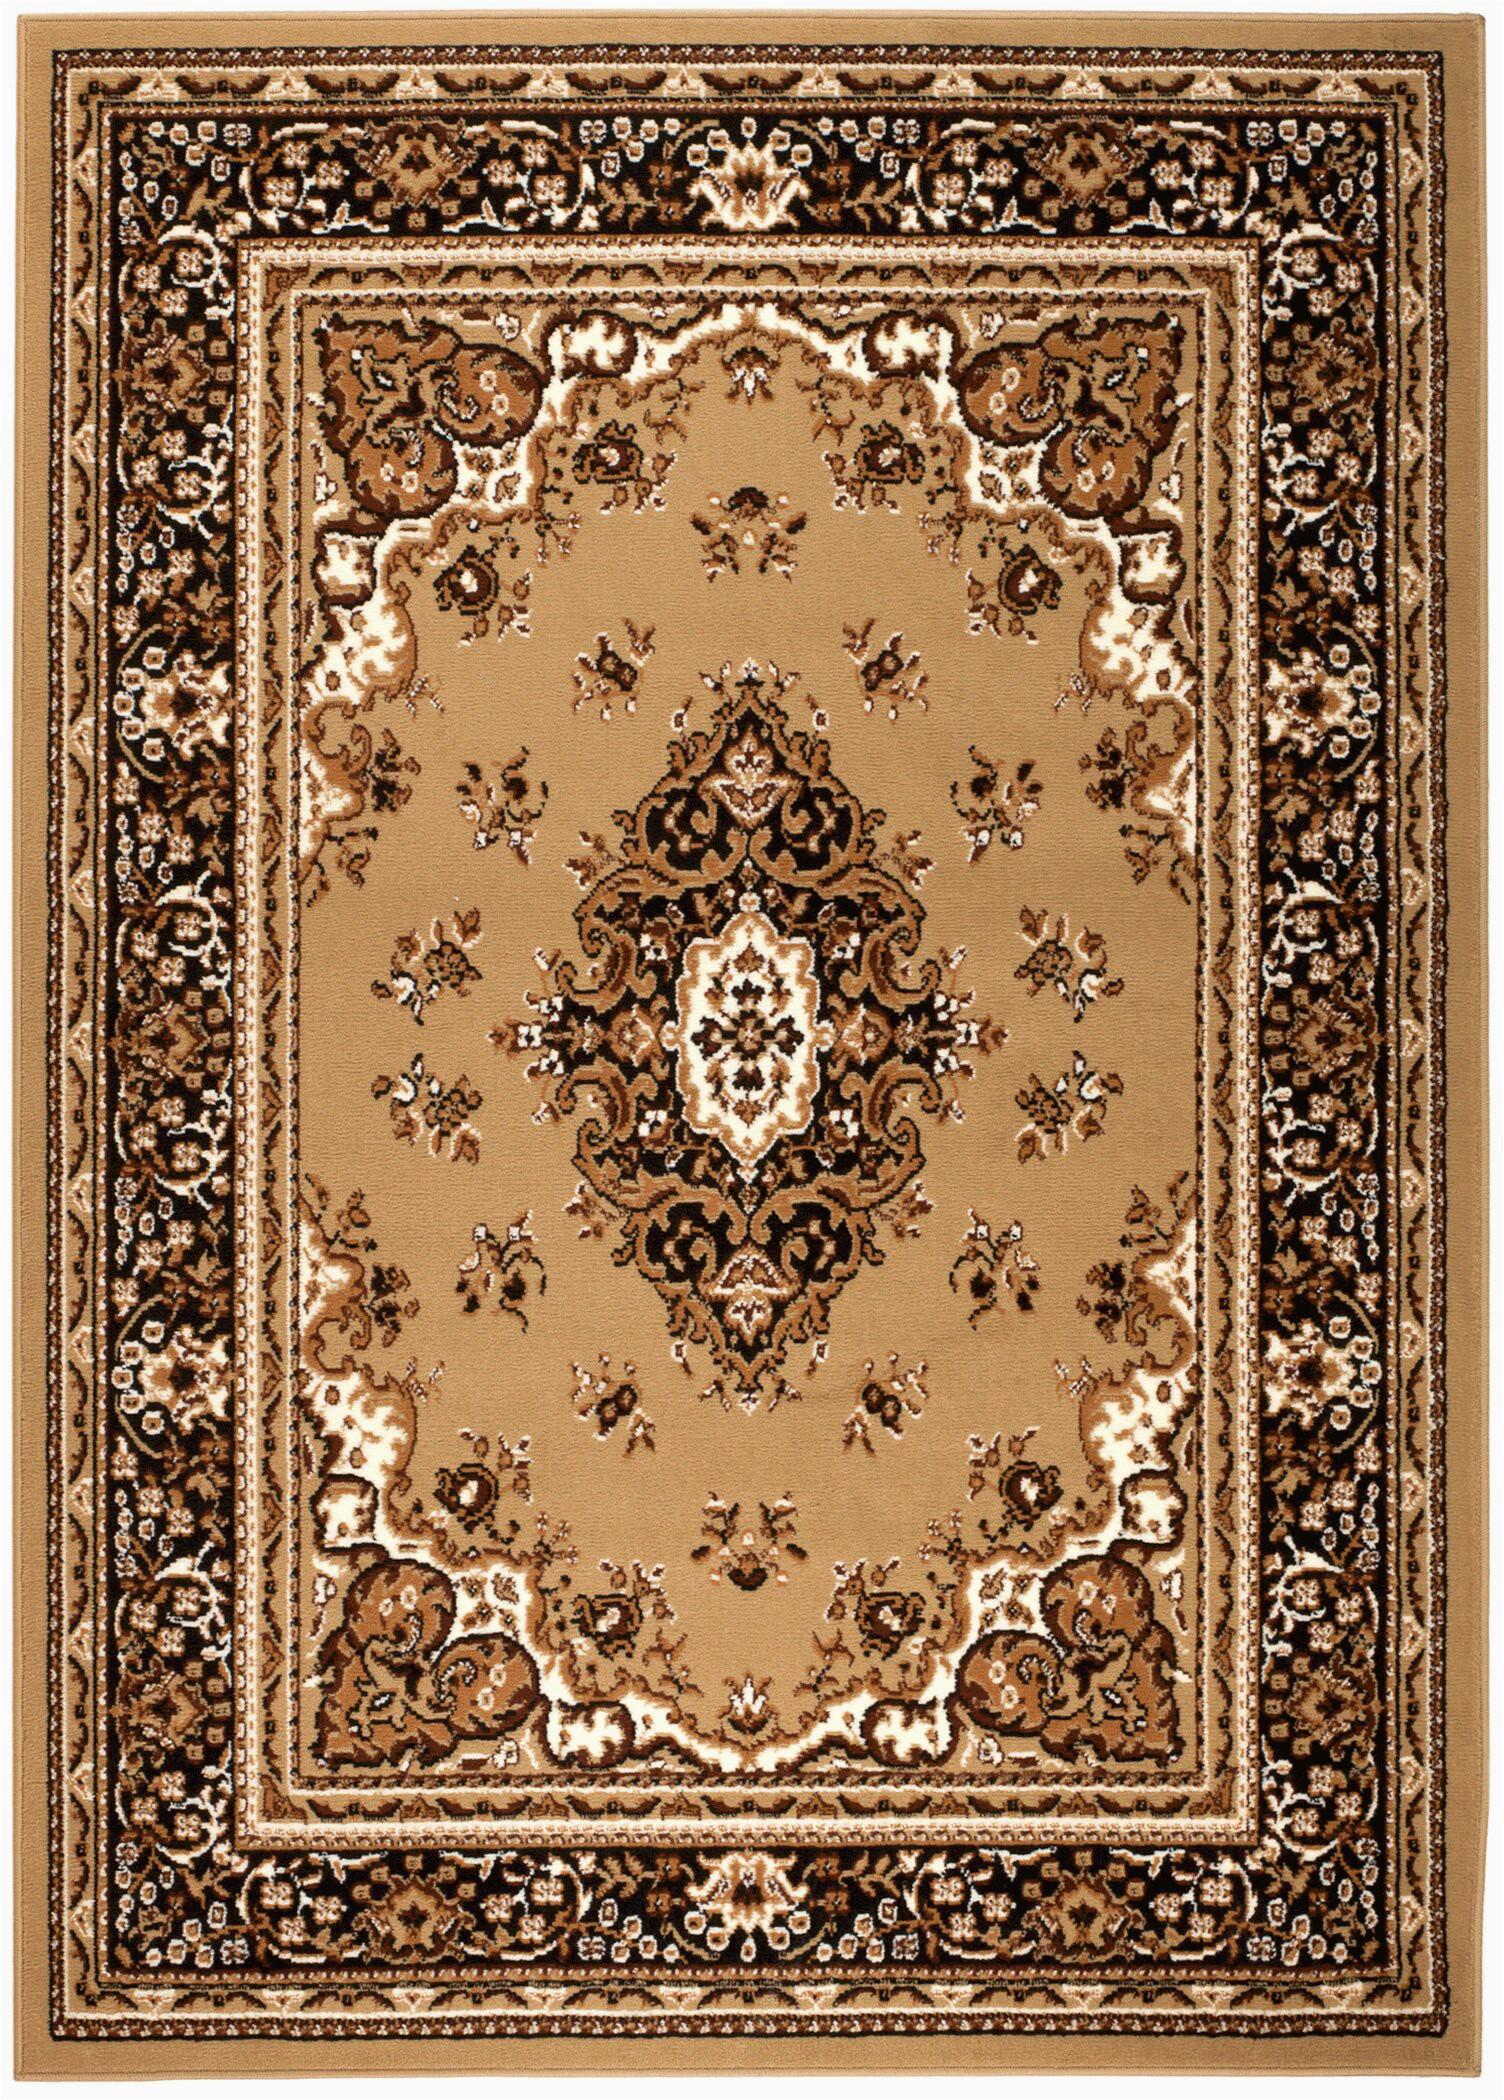 oppelo oriental beigebrown area rug